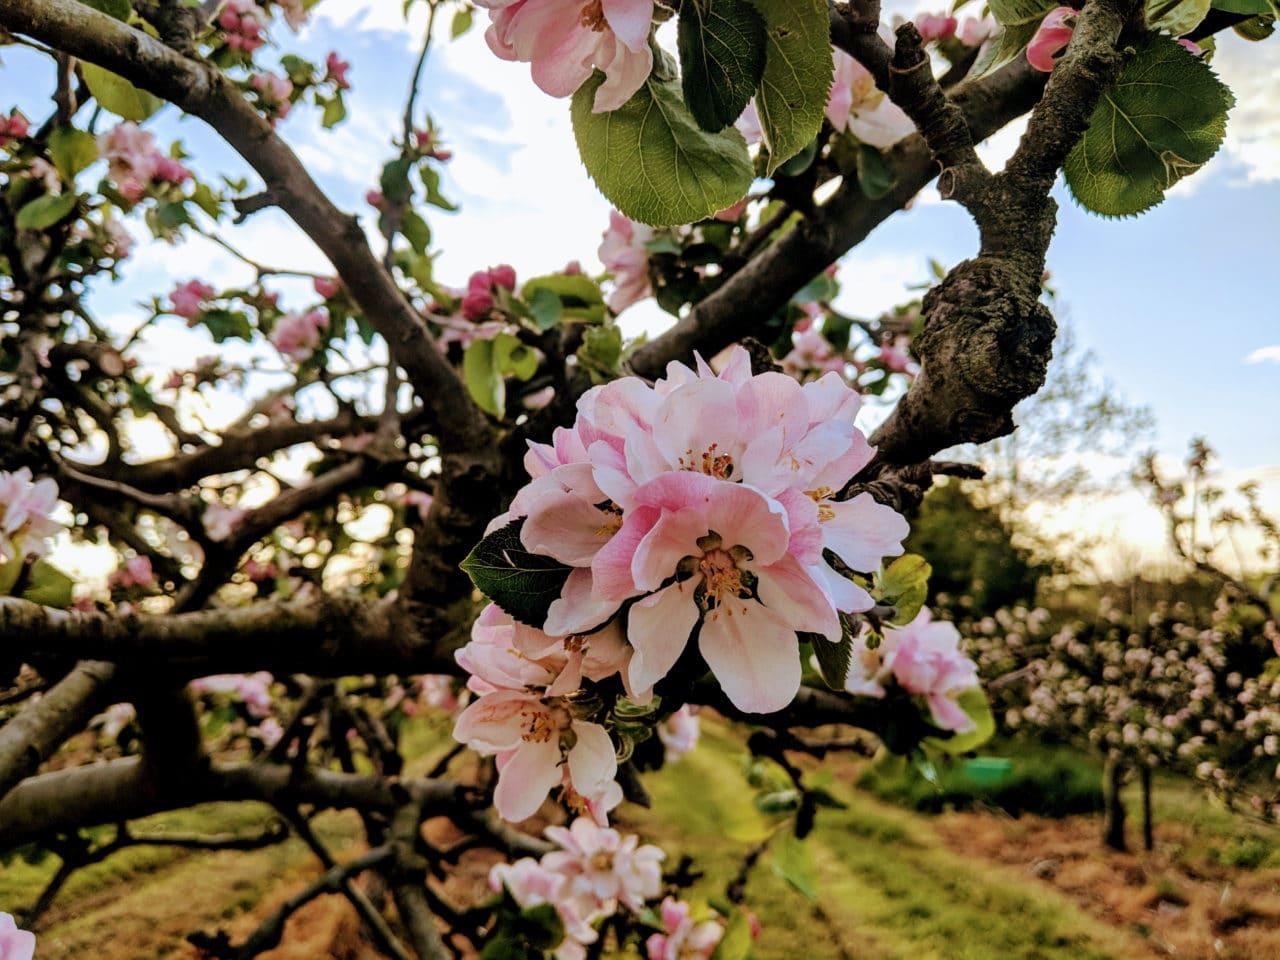 Armagh Orchard County - Byddi Lee